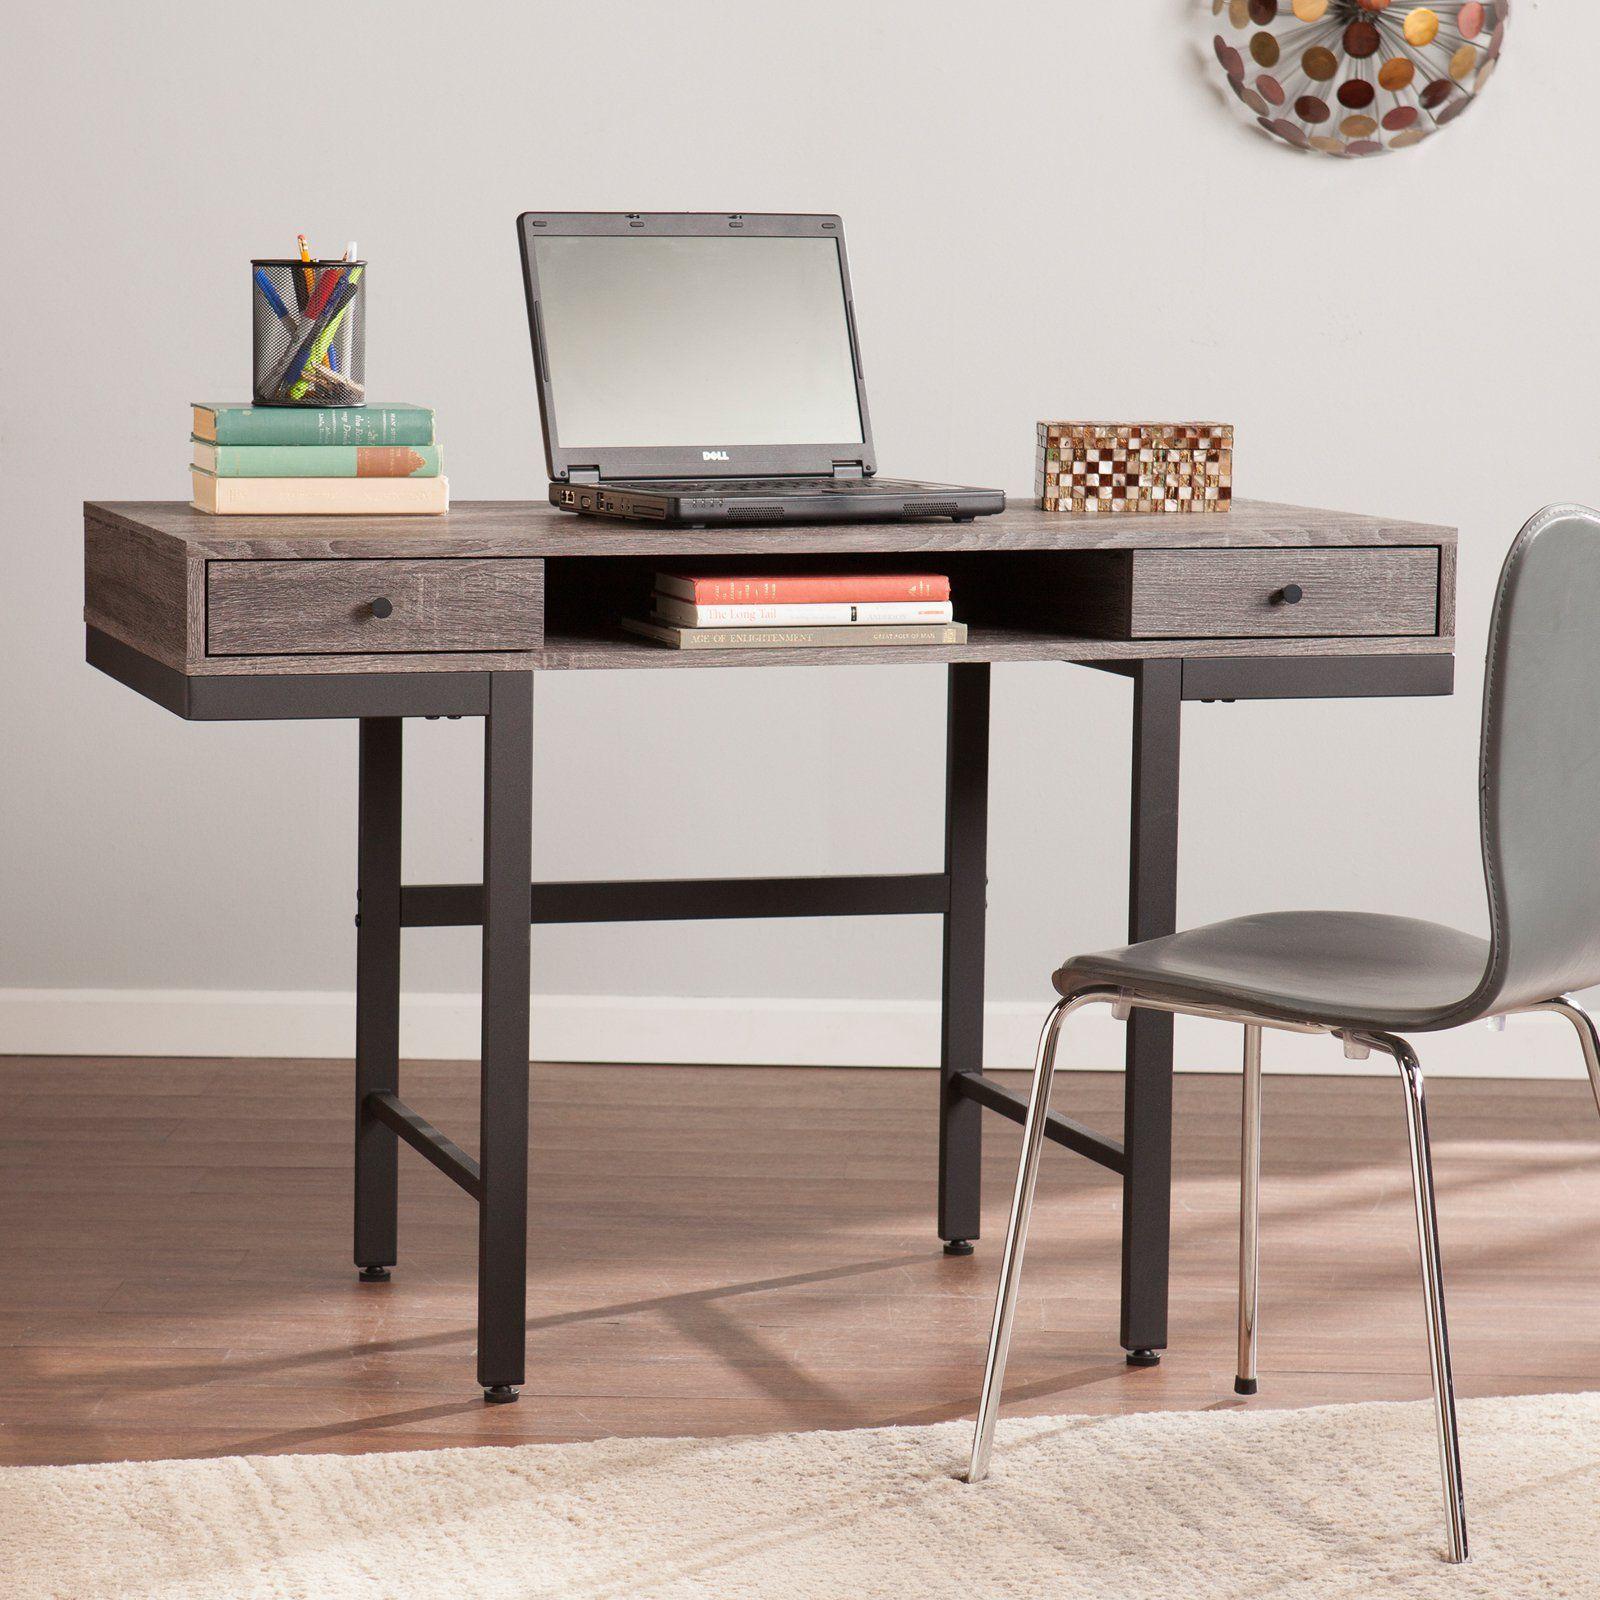 Southern Enterprises Ranleigh Writing Desk Weathered Gray Black Grey Writing Desk Modern Secretary Desk